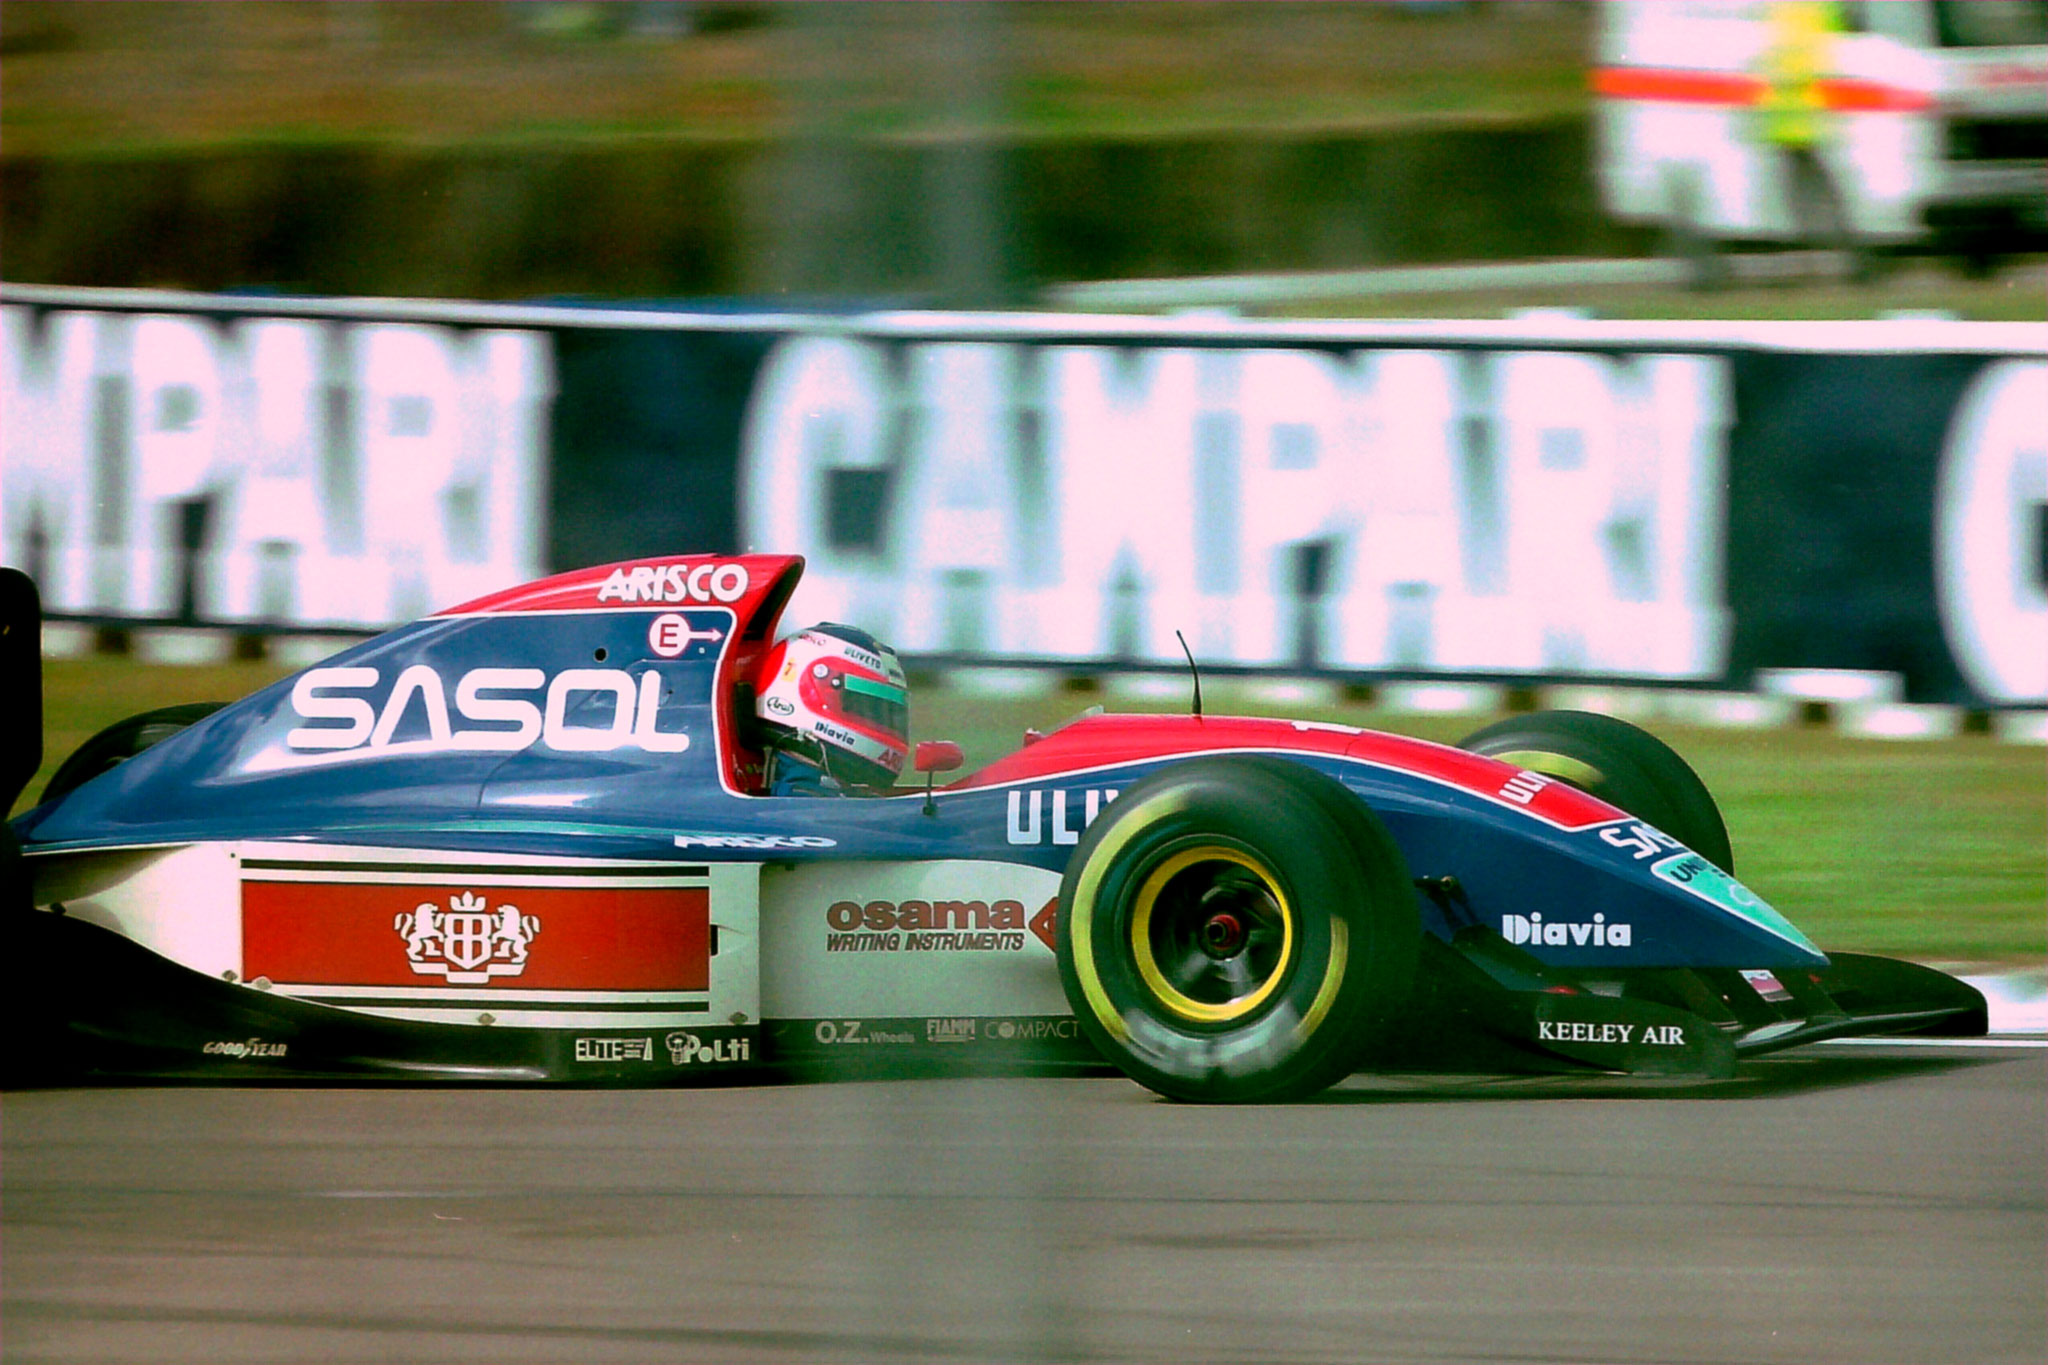 F1 Rubens Barrichello em 1993 - foto by Martin Lee - Flickr